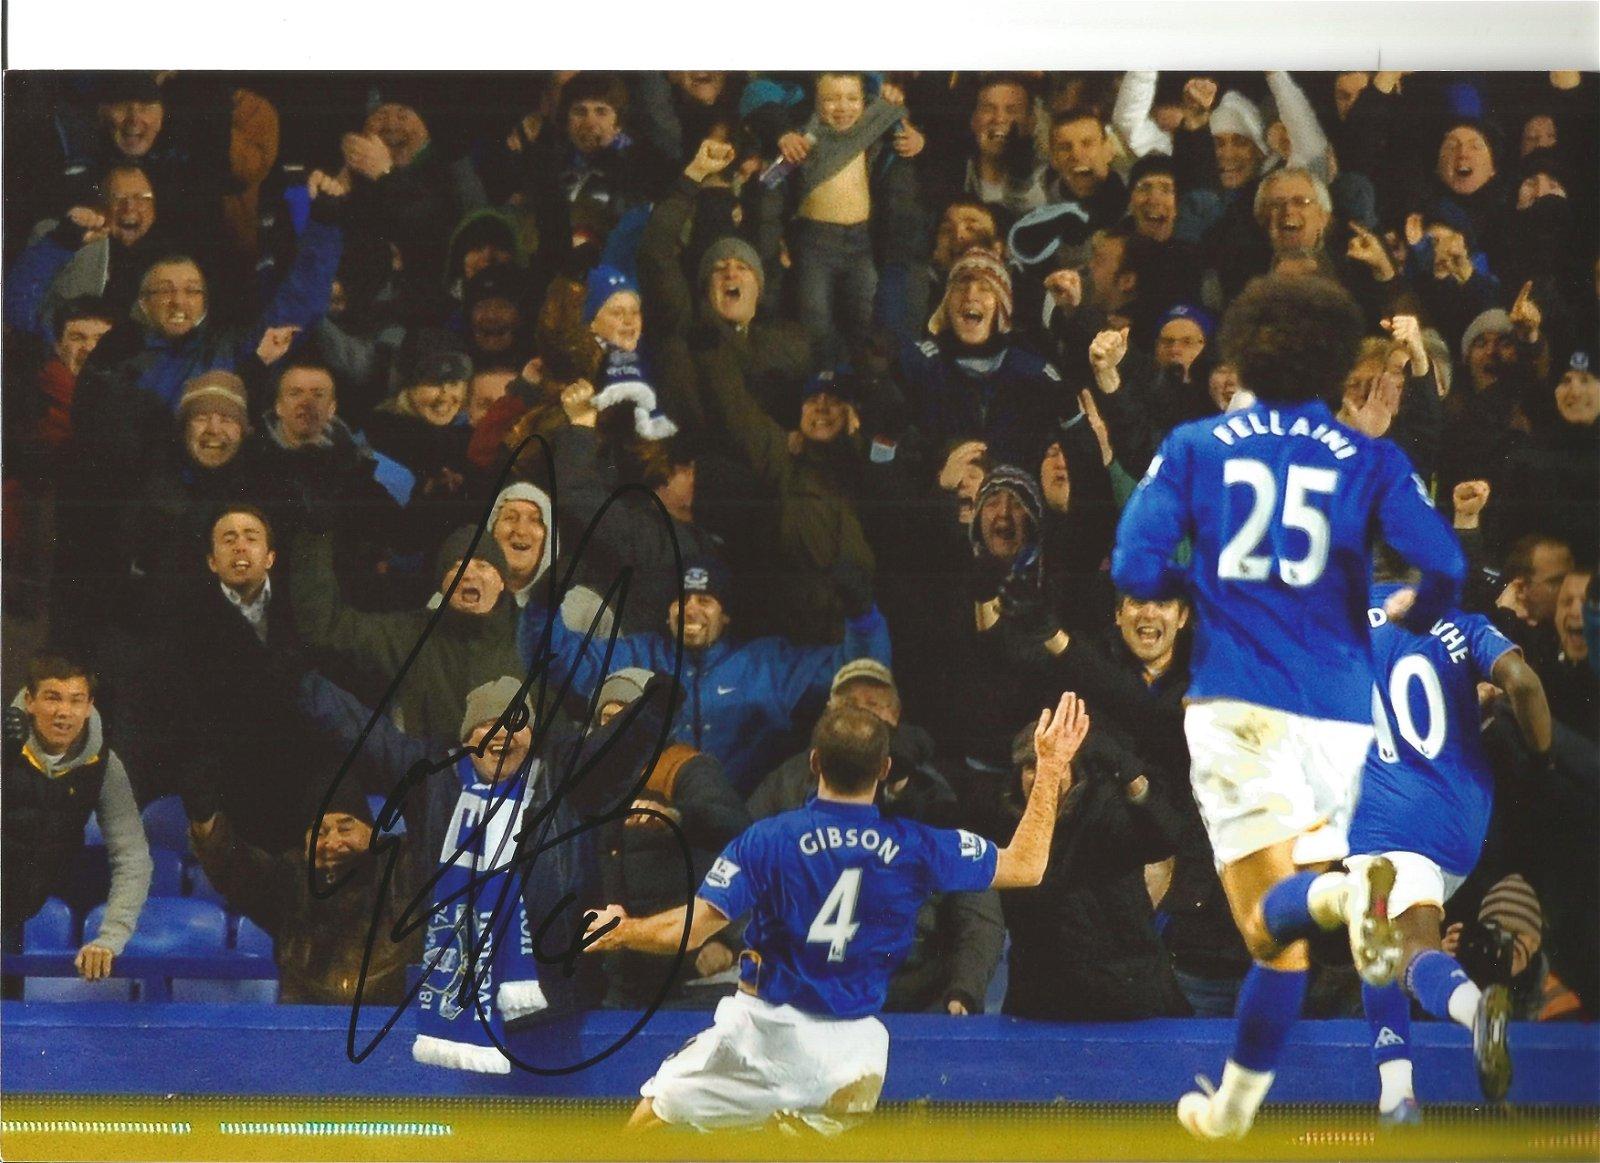 Darron Gibson Everton Signed 12 x 8 inch football